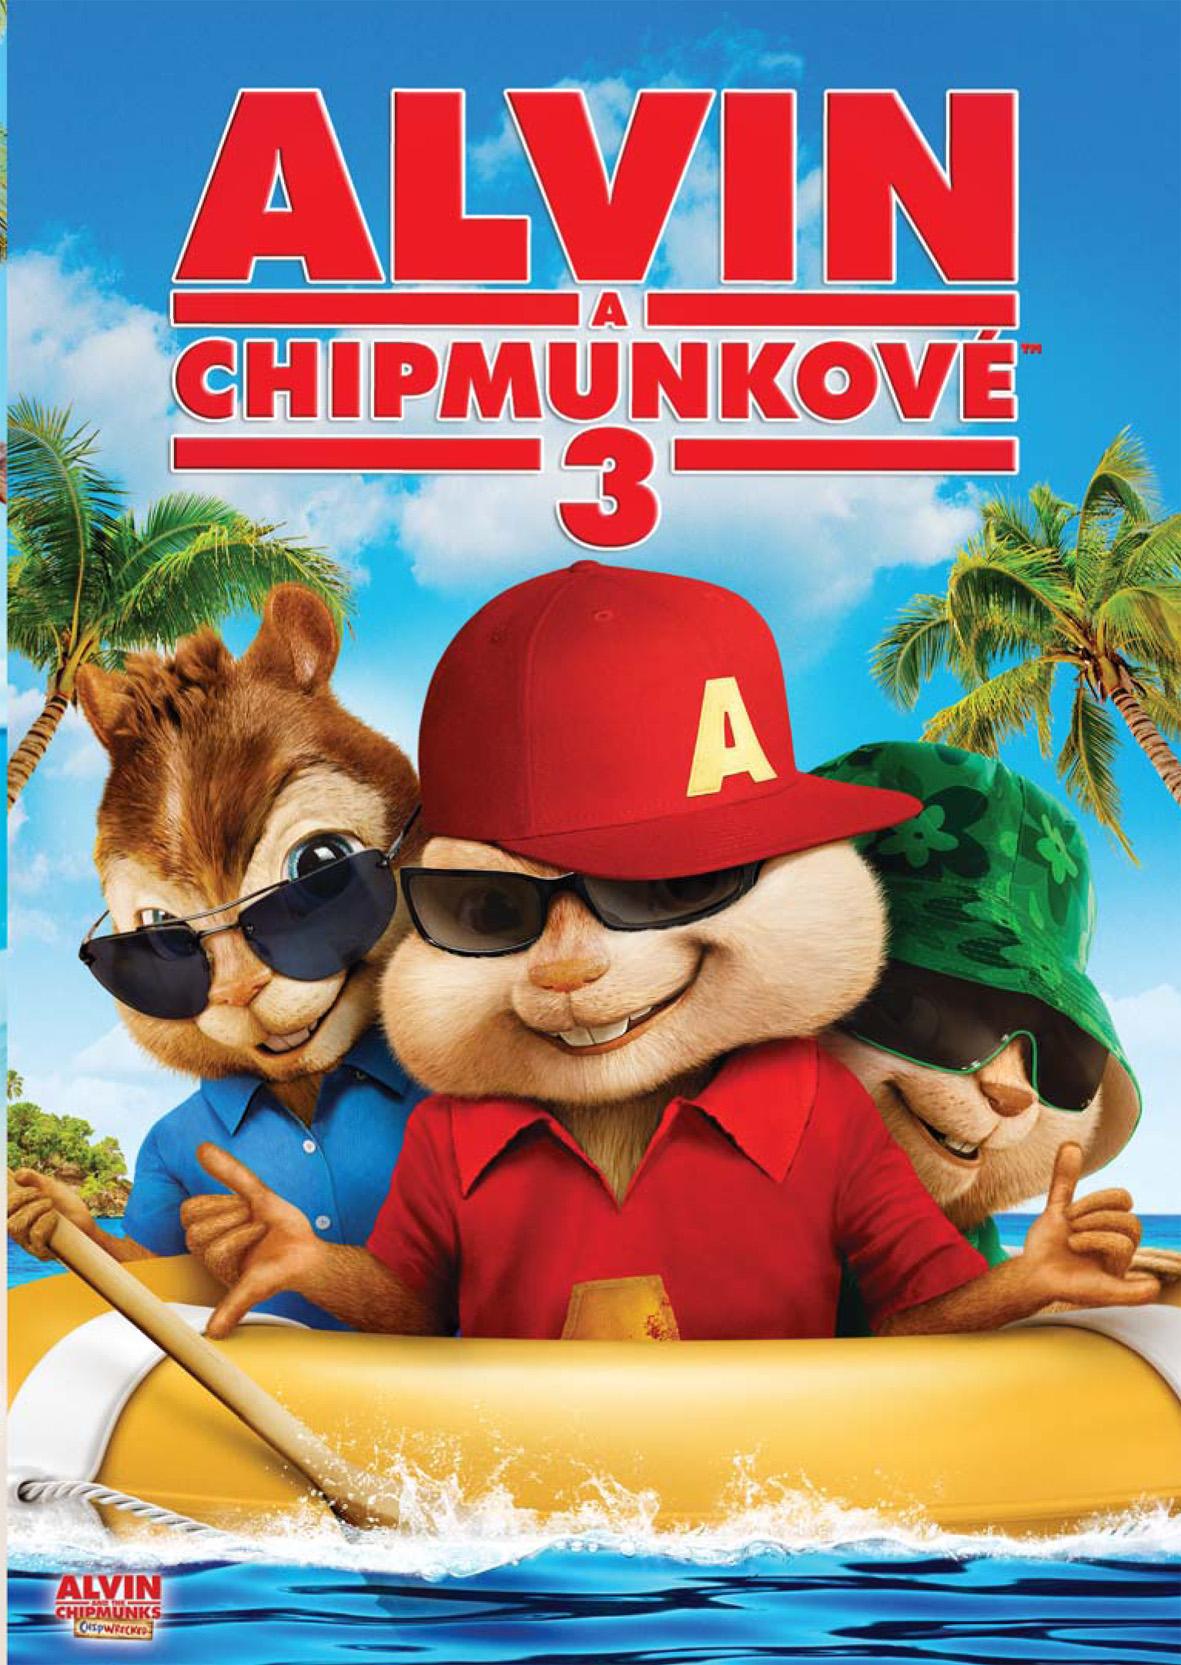 Spustit online film zdarma Alvin a Chipmunkové 3